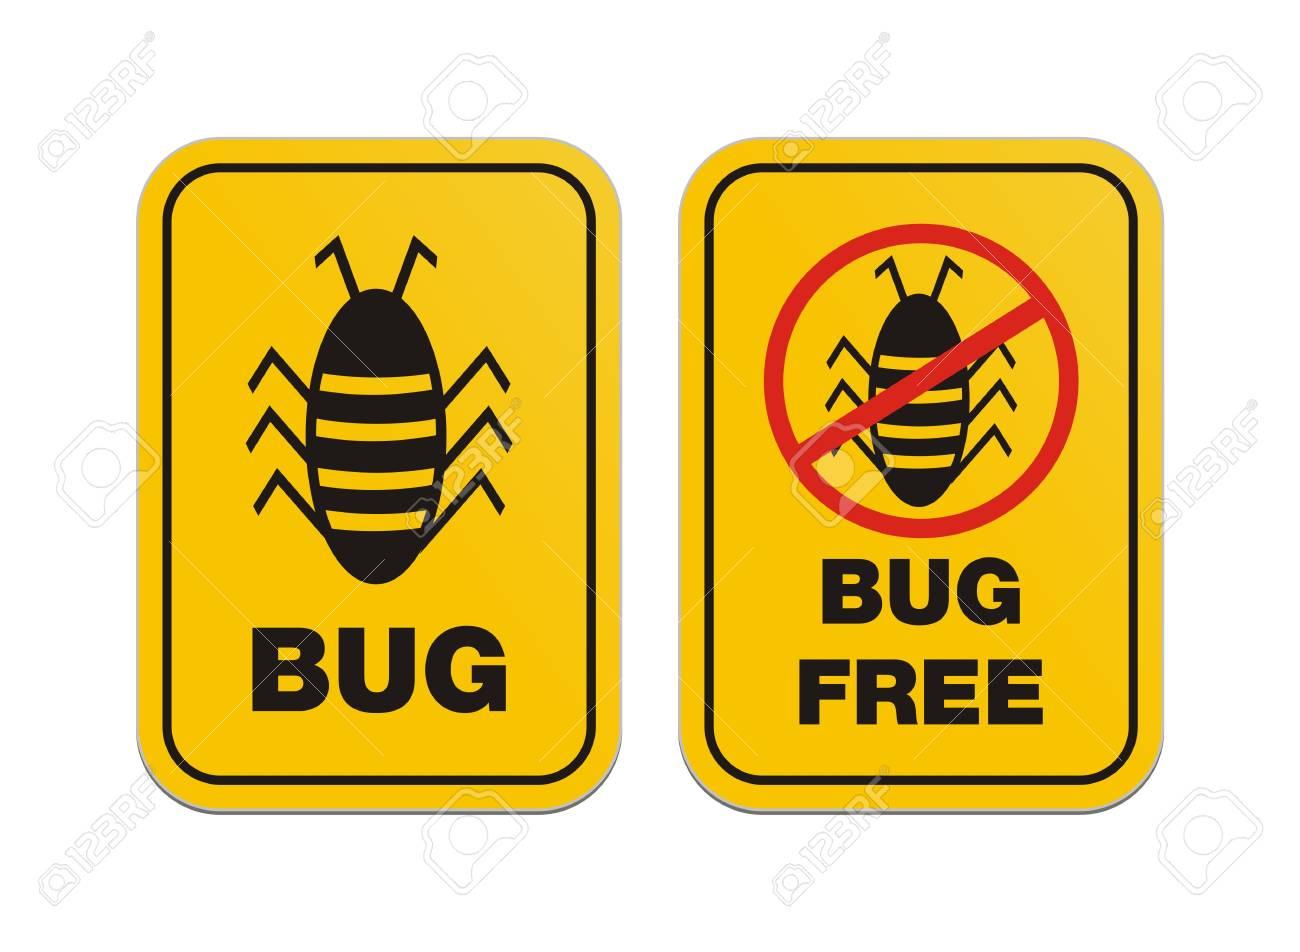 bug free - alert signs Stock Vector - 20363574